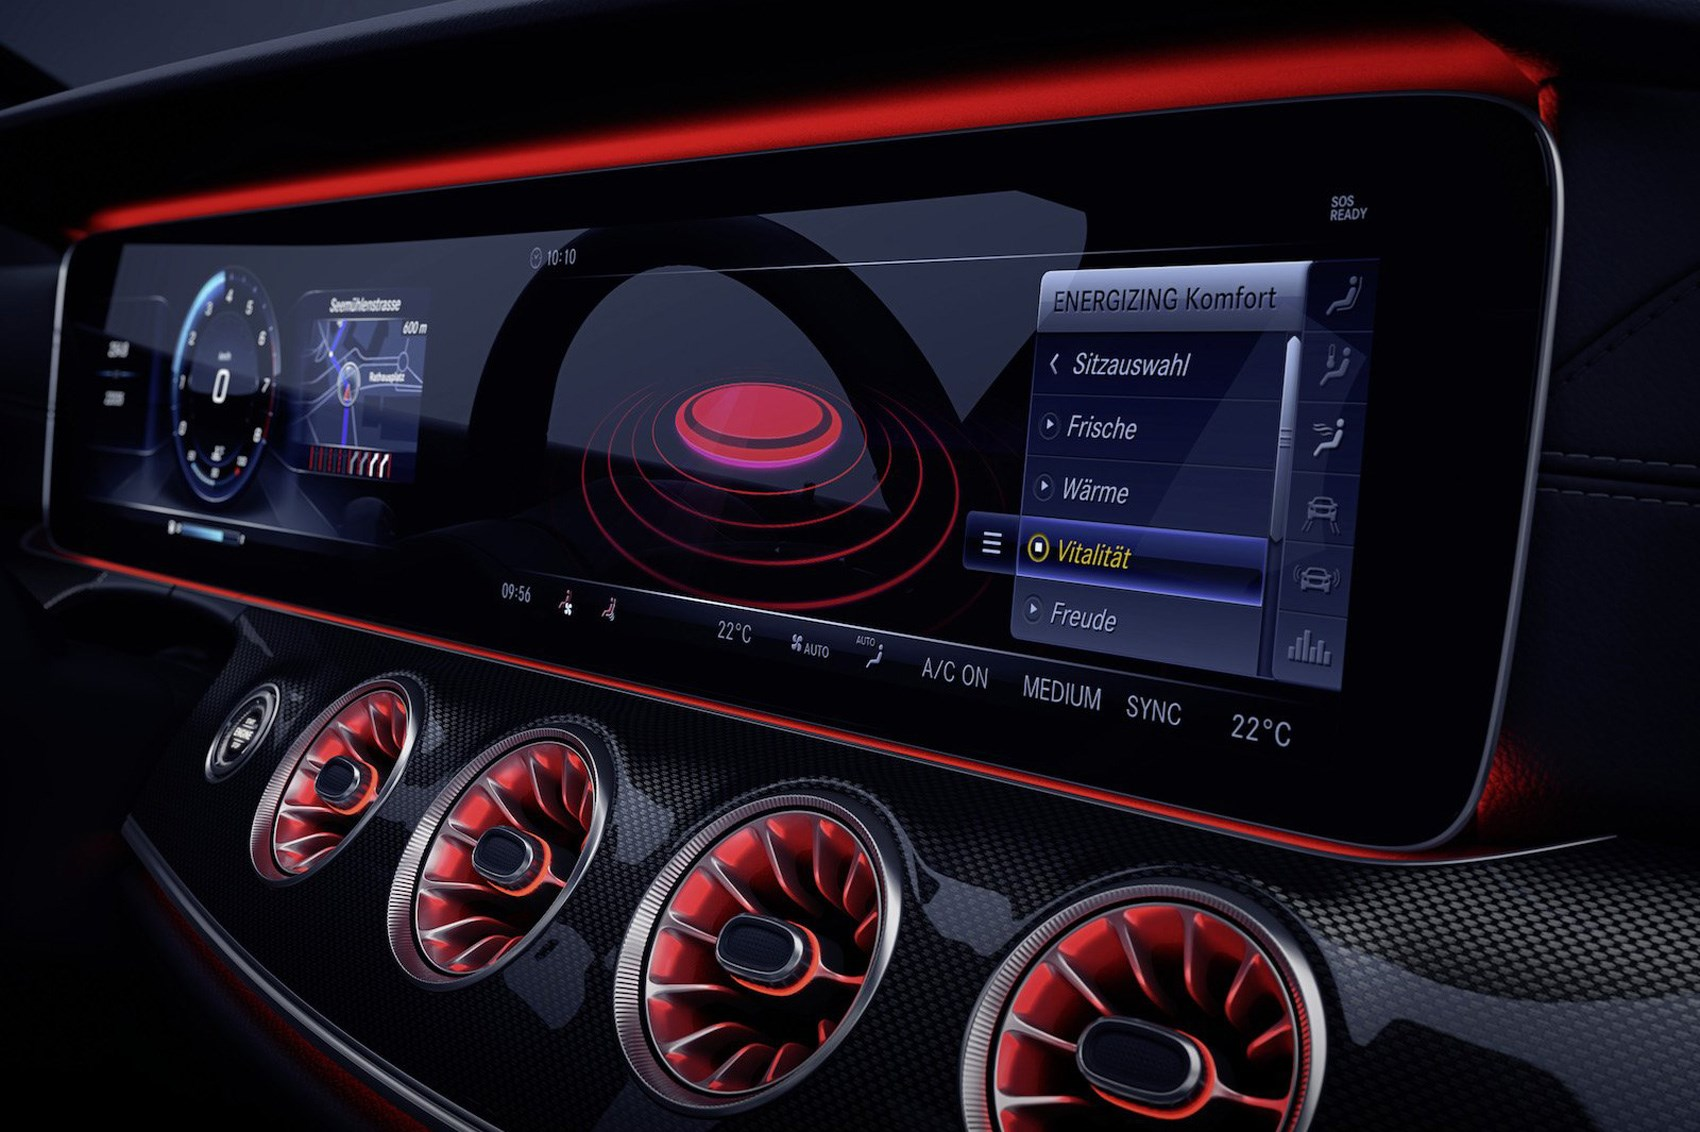 Mercedes-Benz E-Class: Automatic interior lighting control